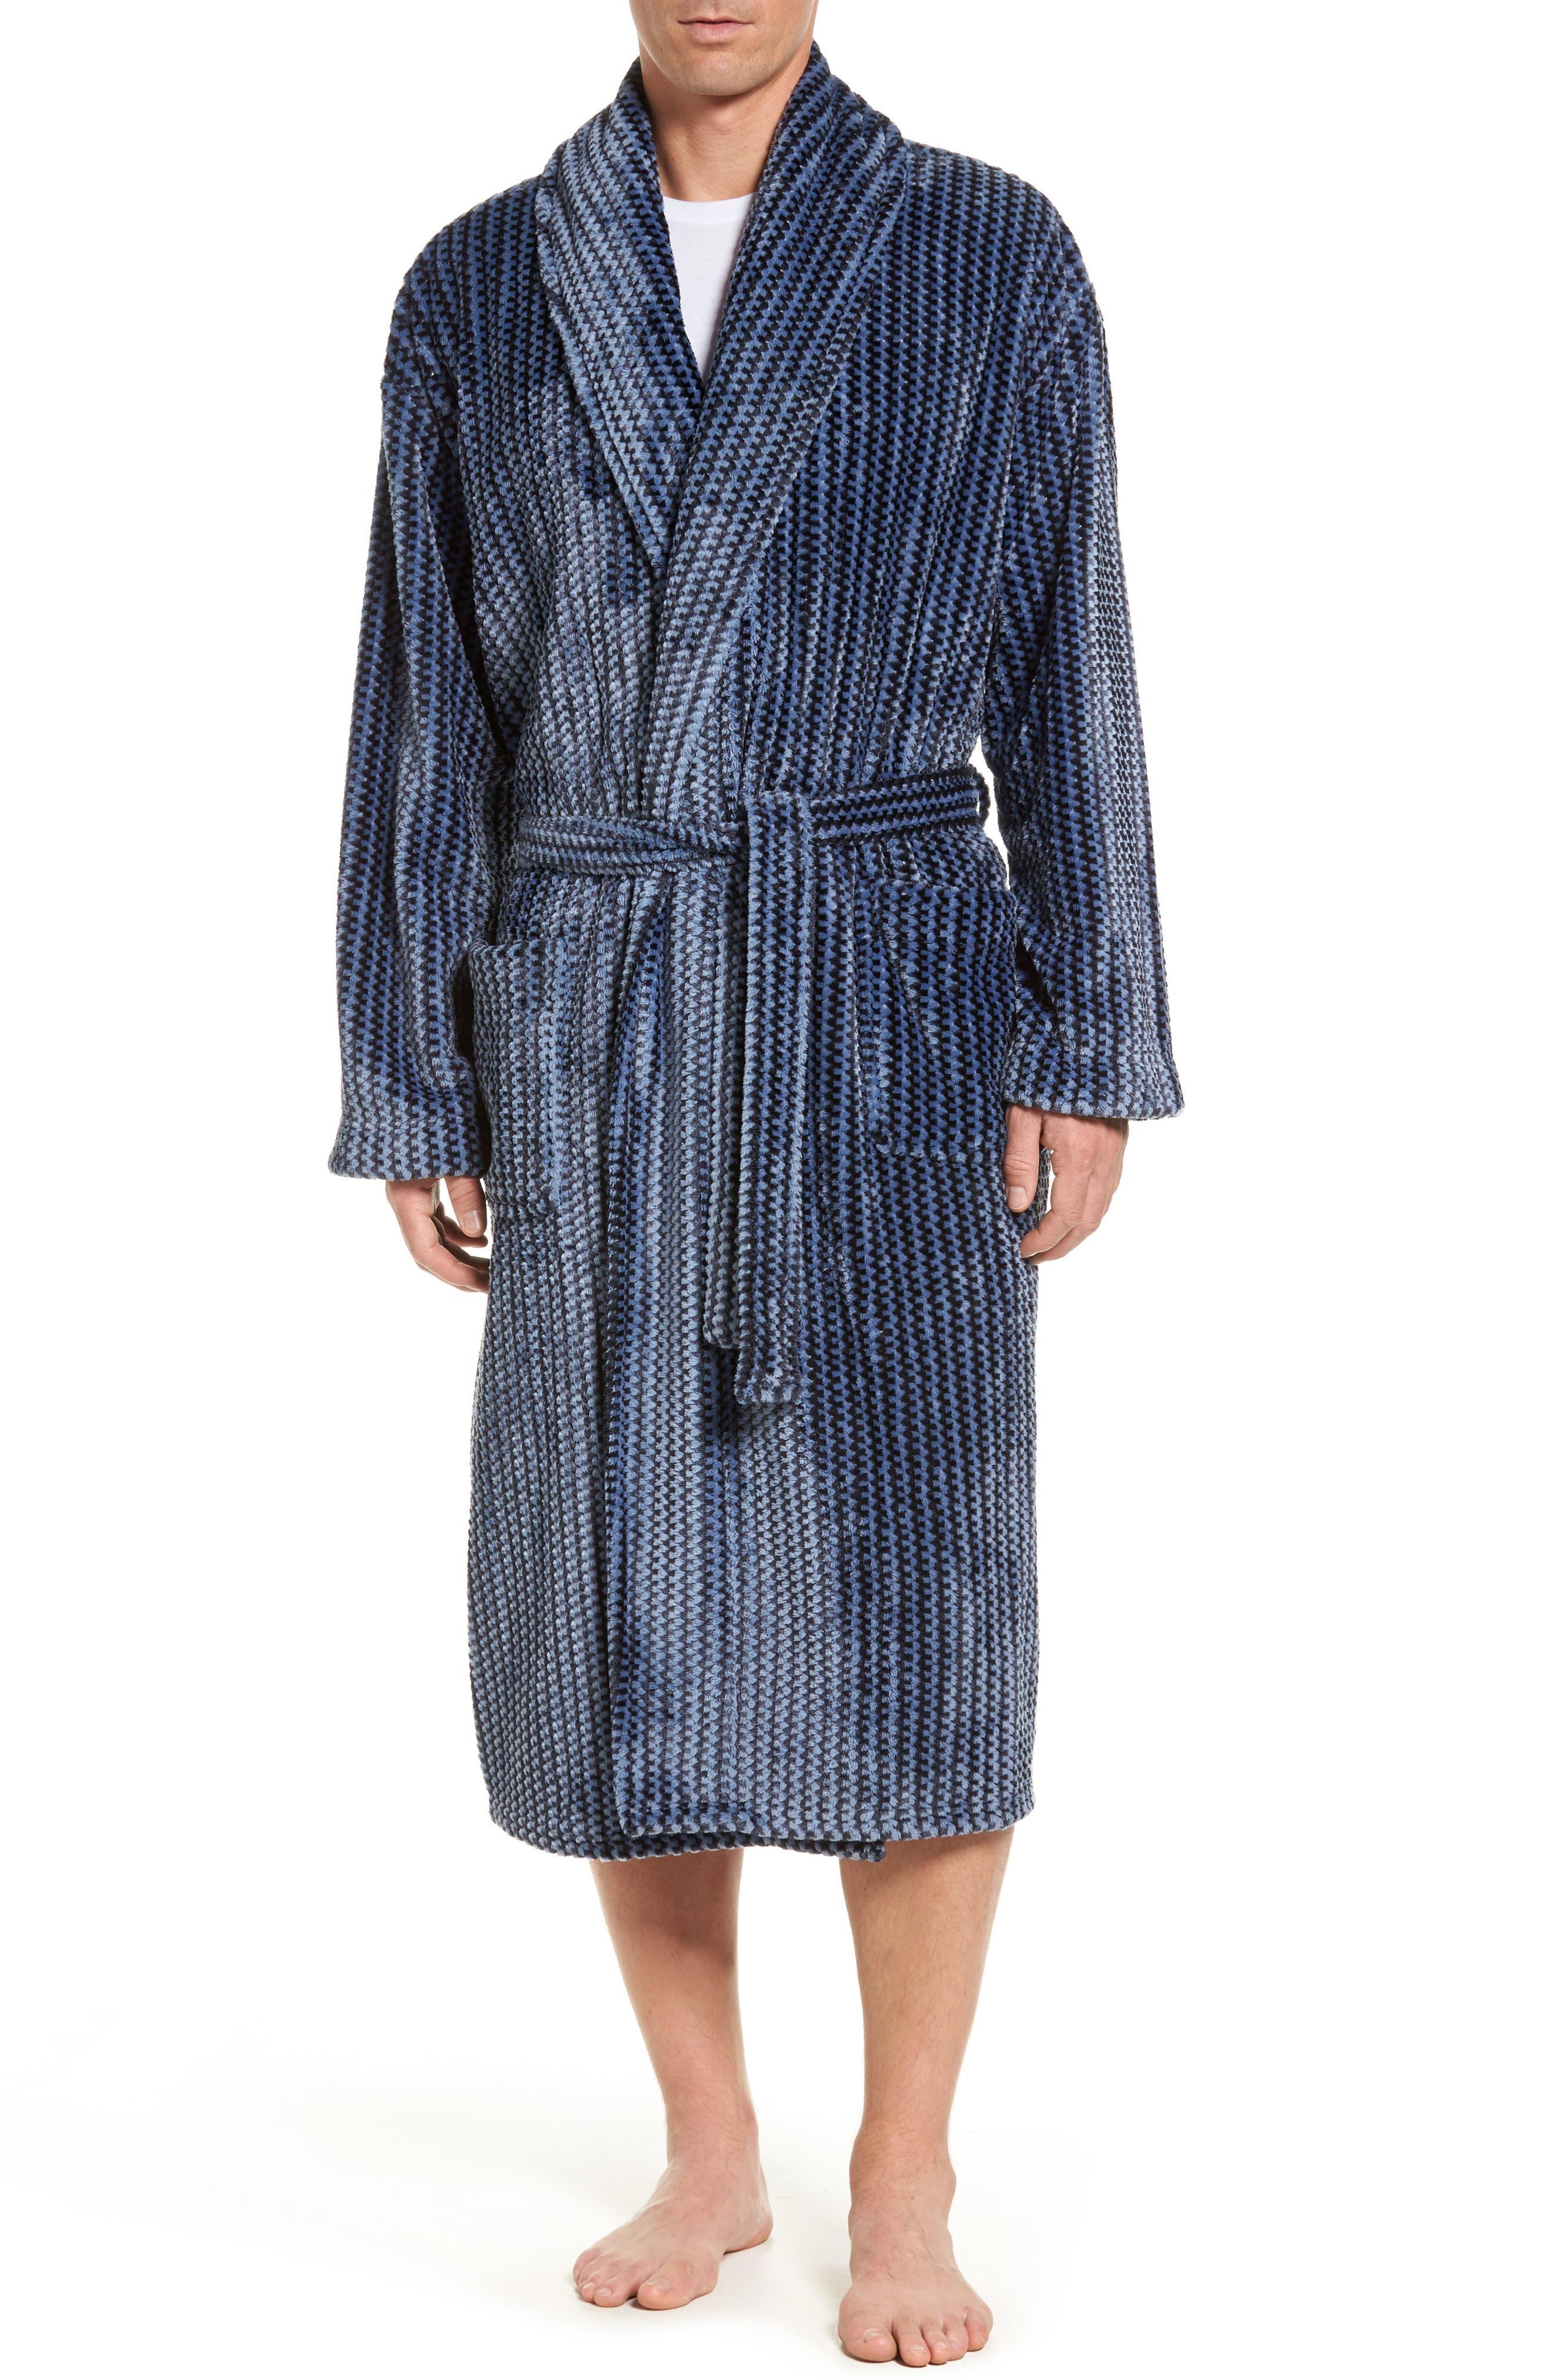 Majestic Metro Marled Robe In Light Blue  2e1904455